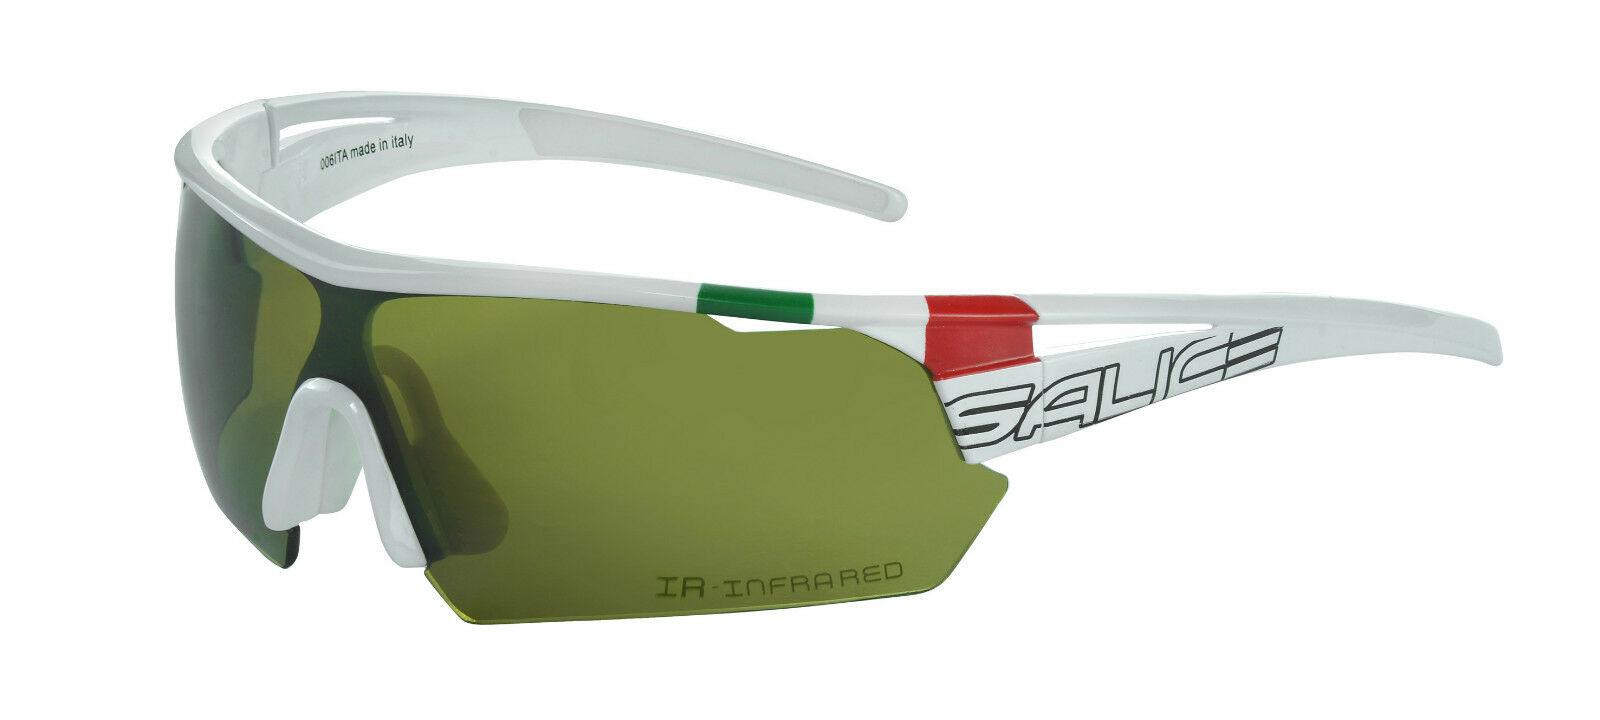 Sunglasses SALICE 006ita MOD.  White Lens Rainbow Infrared Glasses SALICE 006ITA  save 35% - 70% off